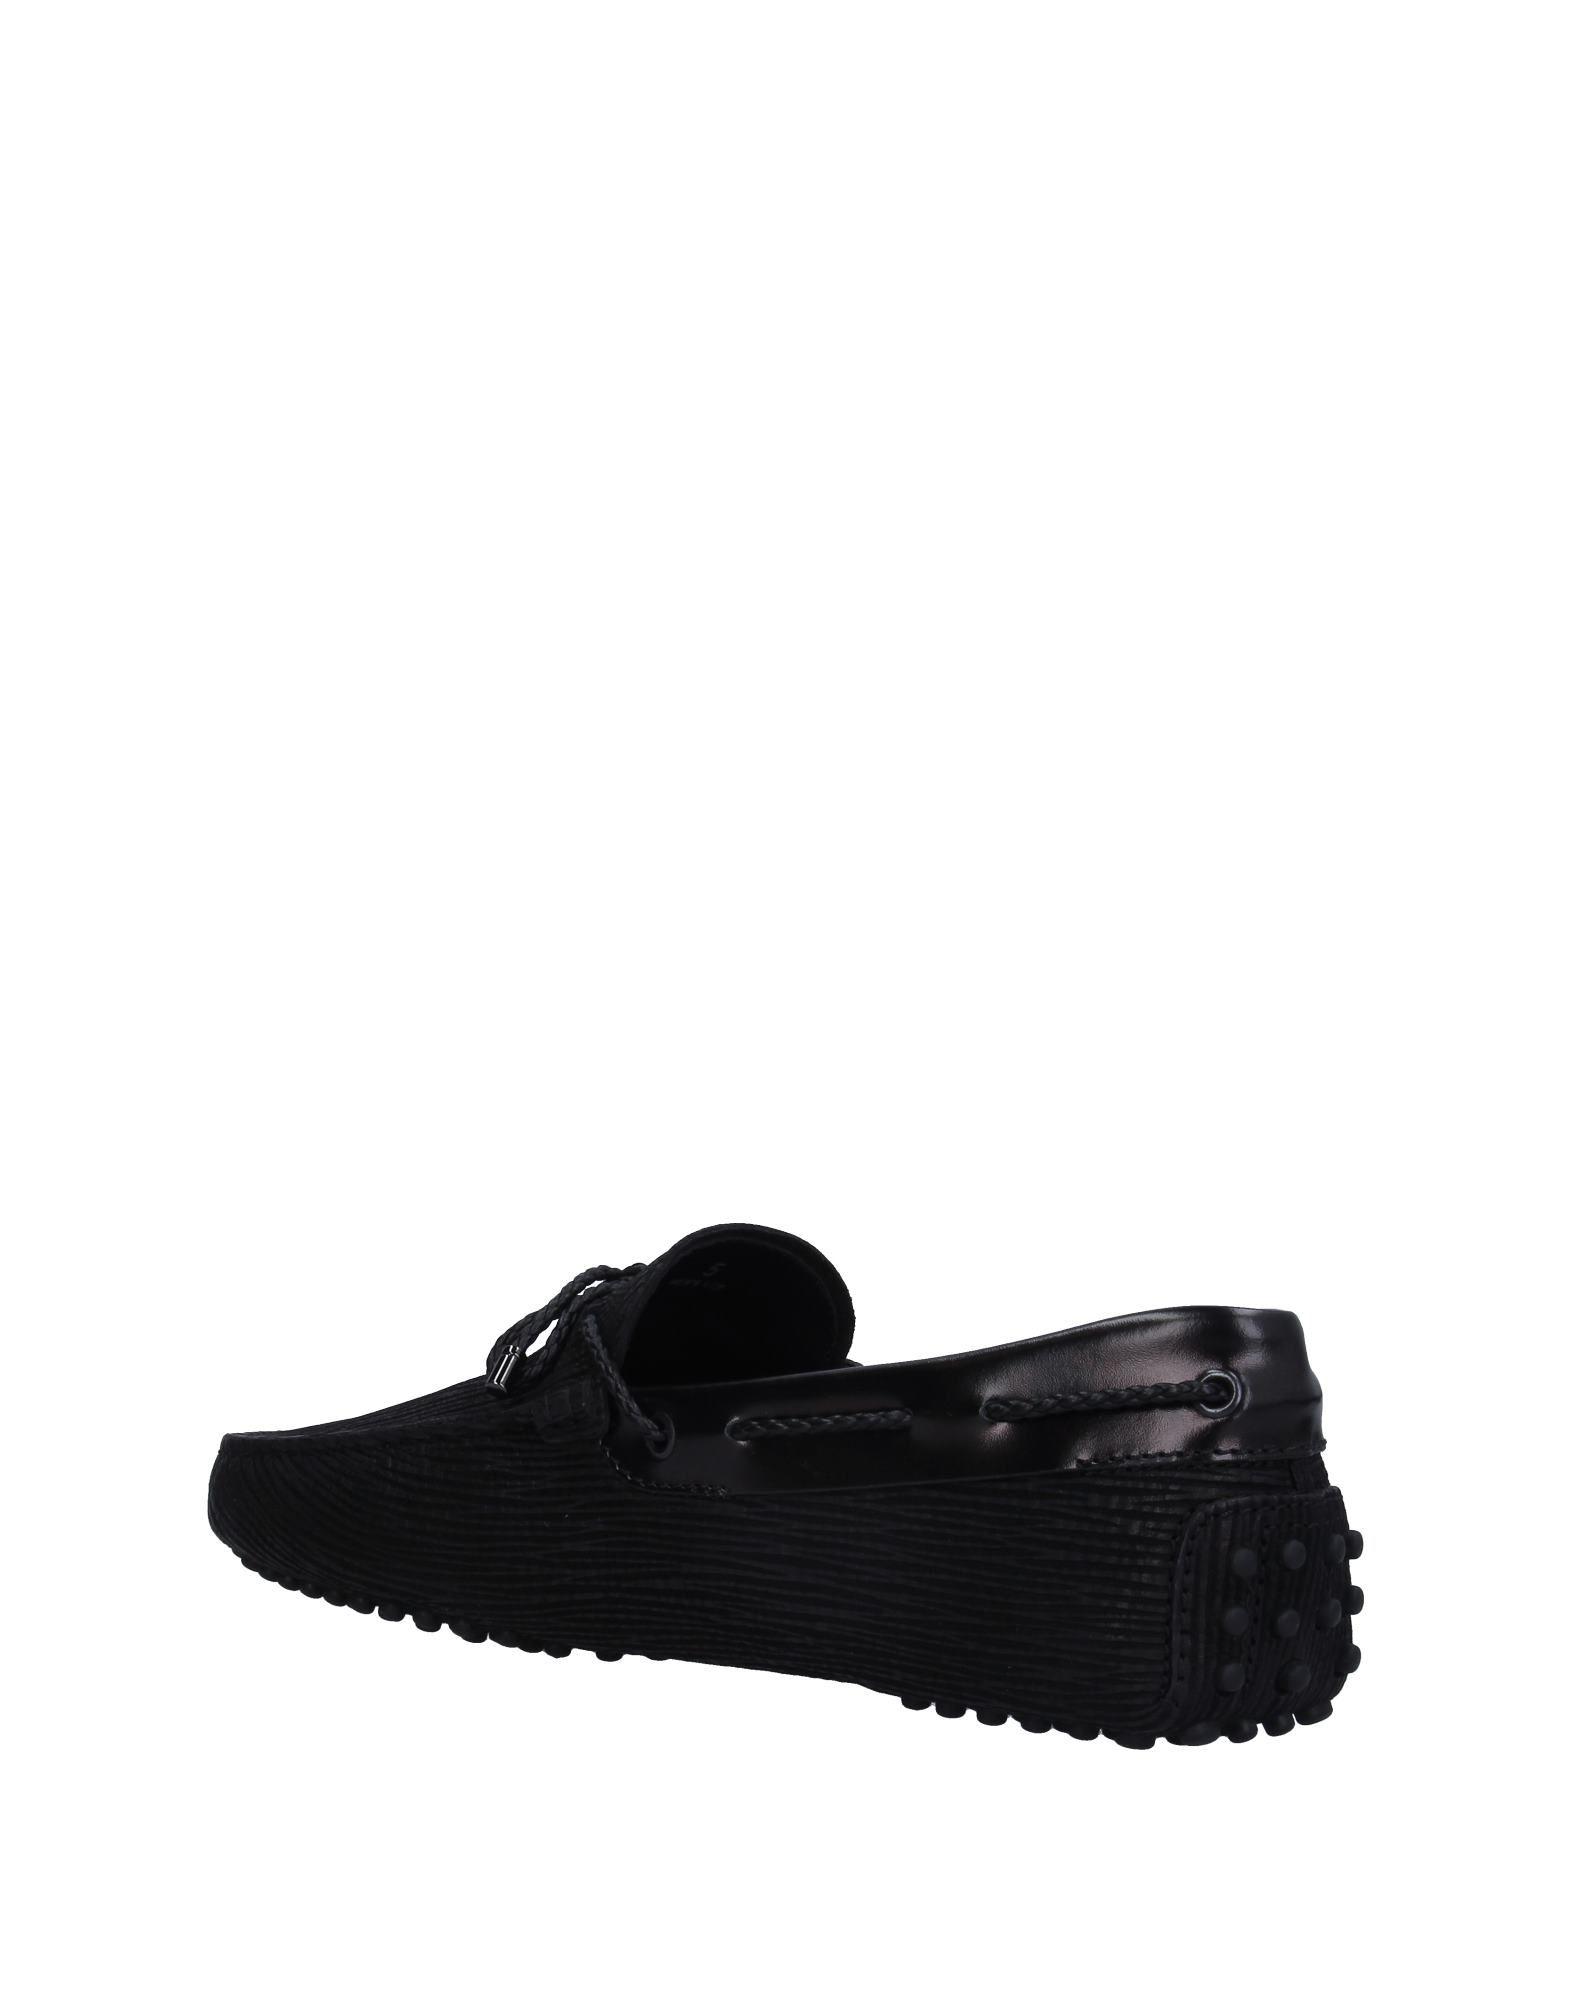 Tod's Mokassins Herren  11299306AJ Gute Qualität beliebte Schuhe